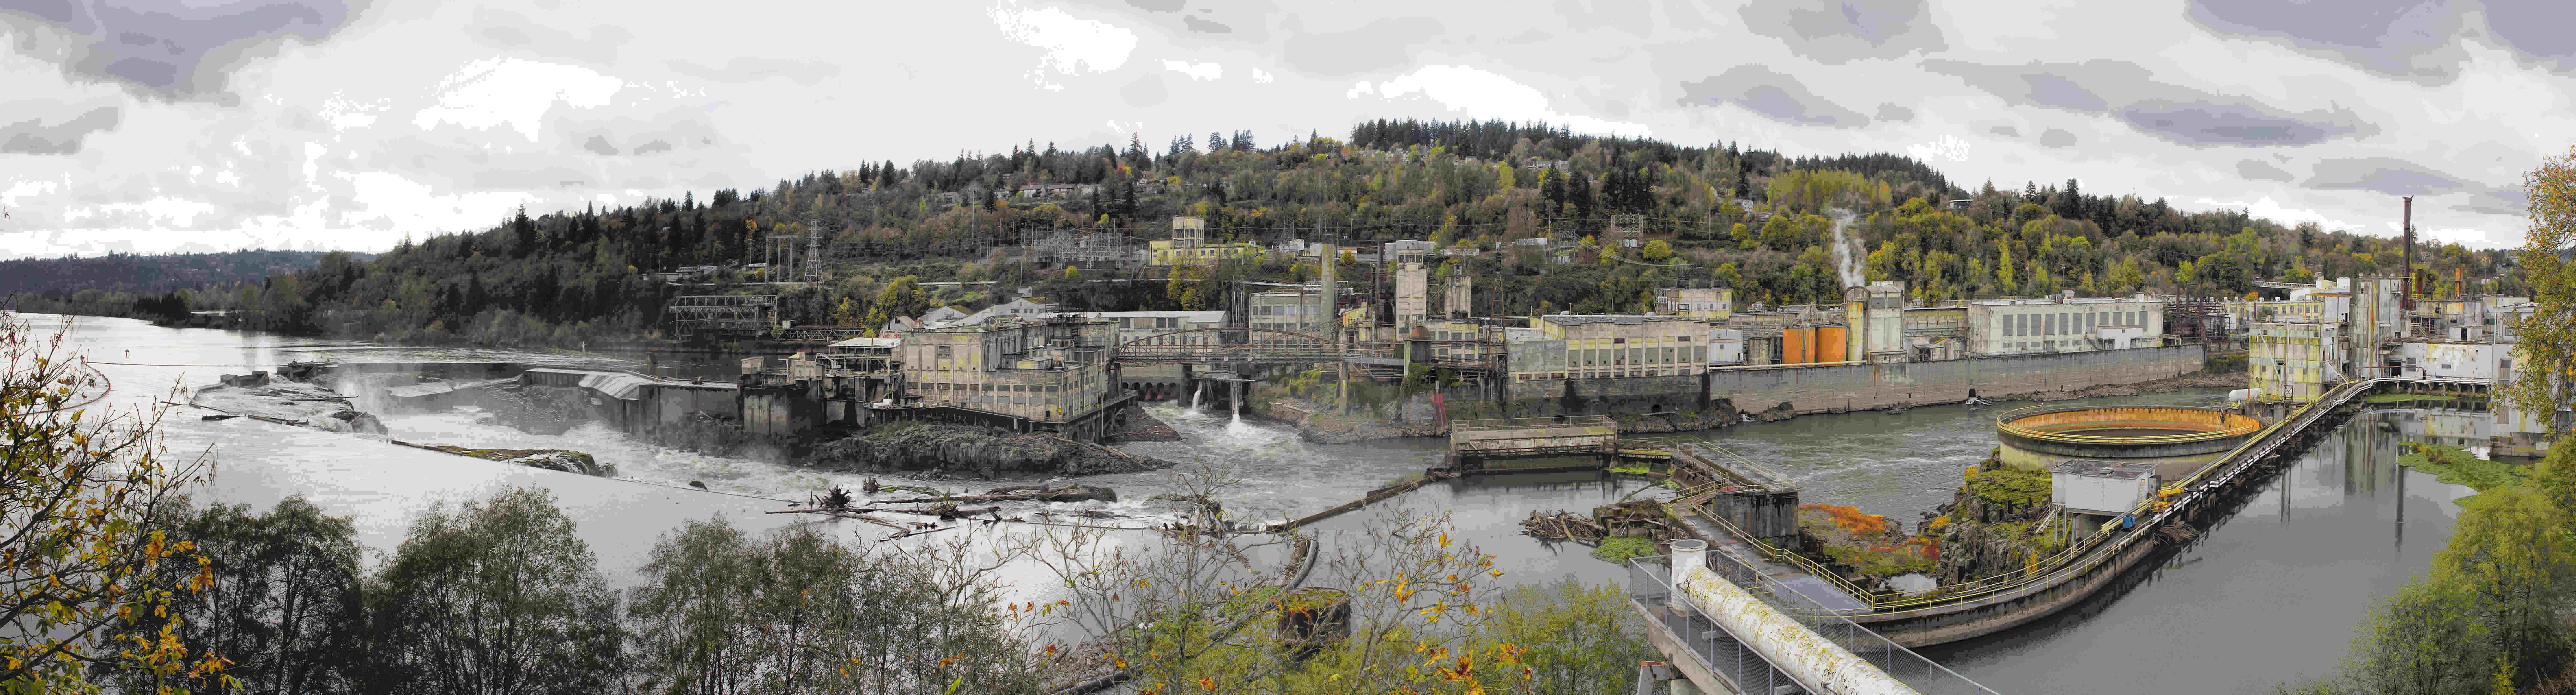 Hydro Power Plant at Willamette Falls Lock in Oregon City at Fall Season Panorama